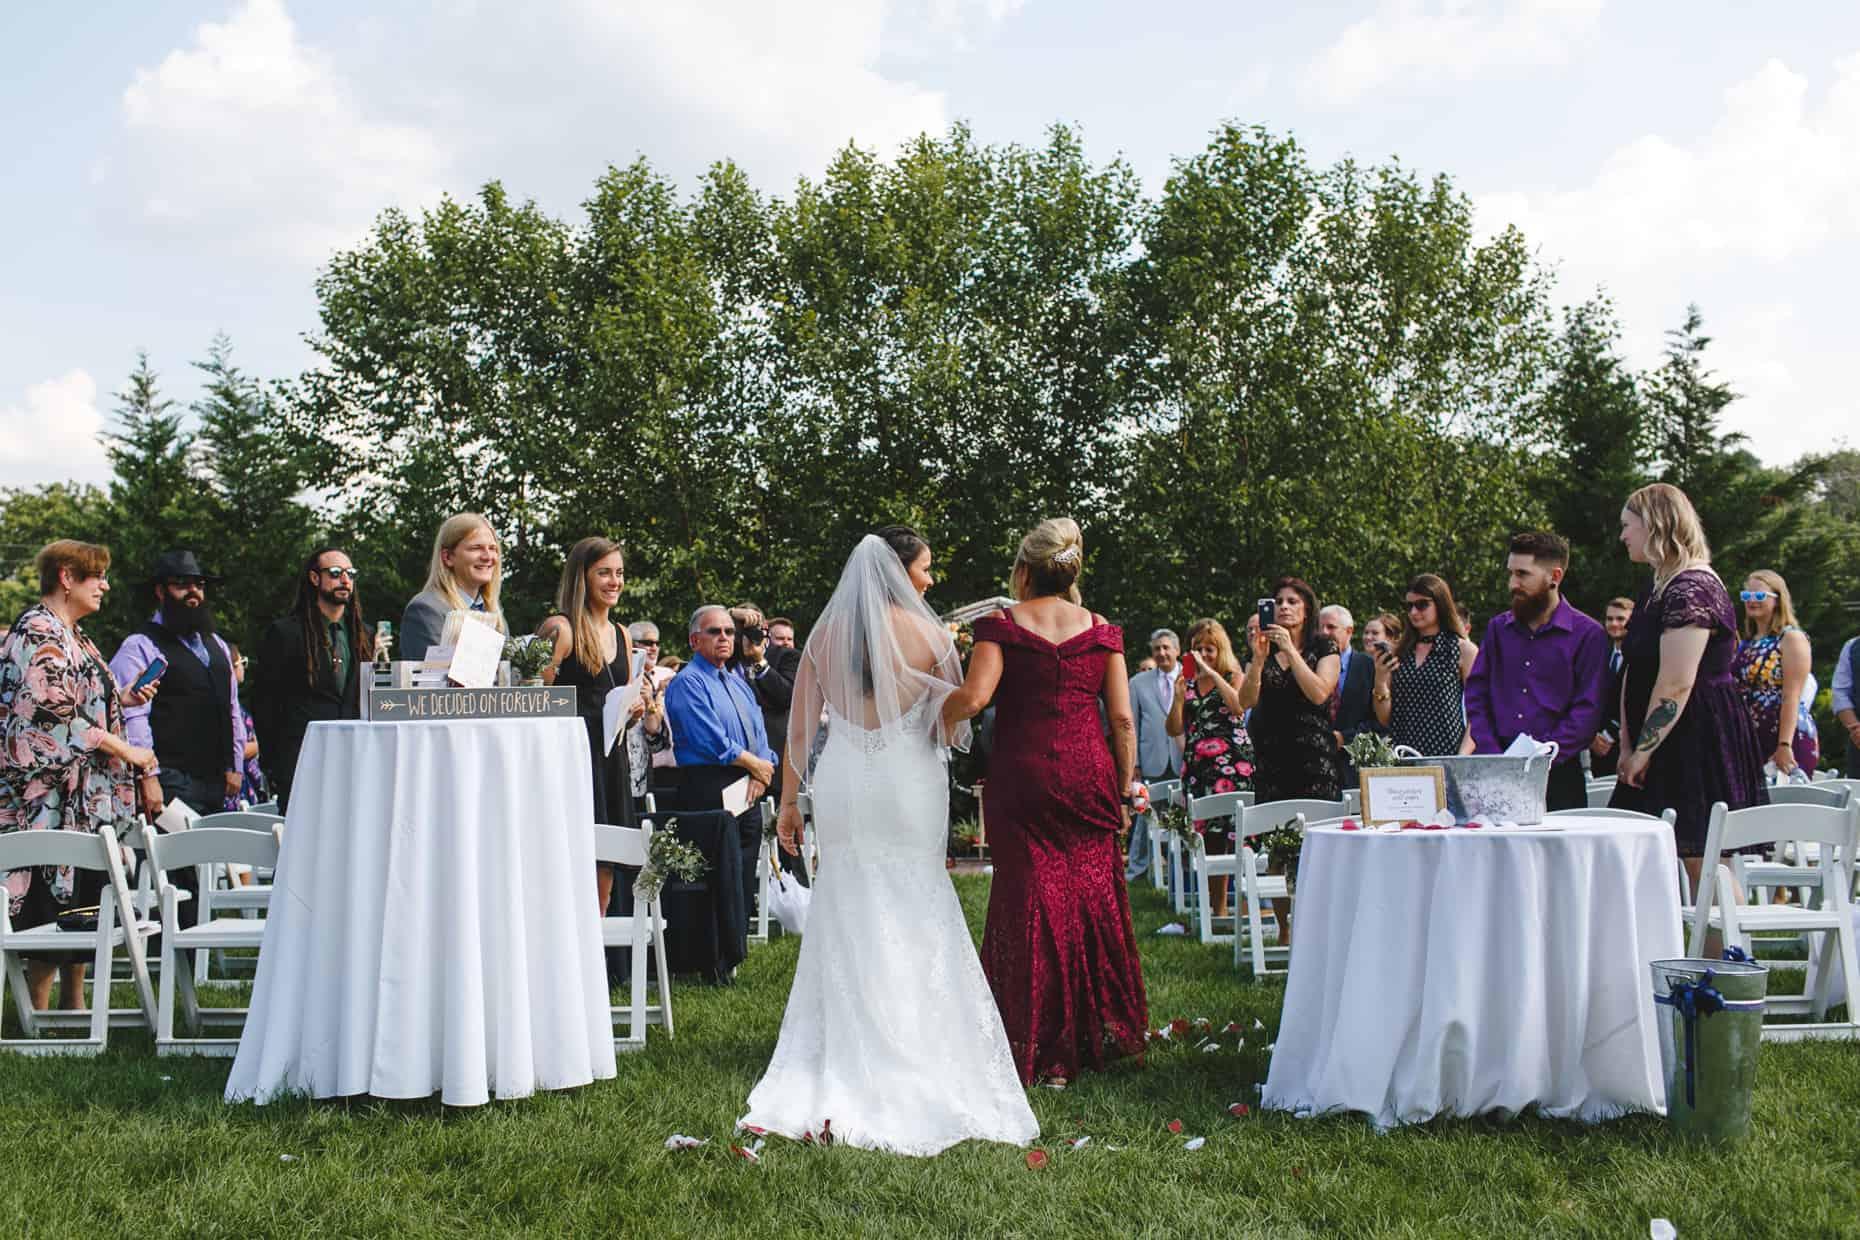 Barn on Bridge Collegeville wedding